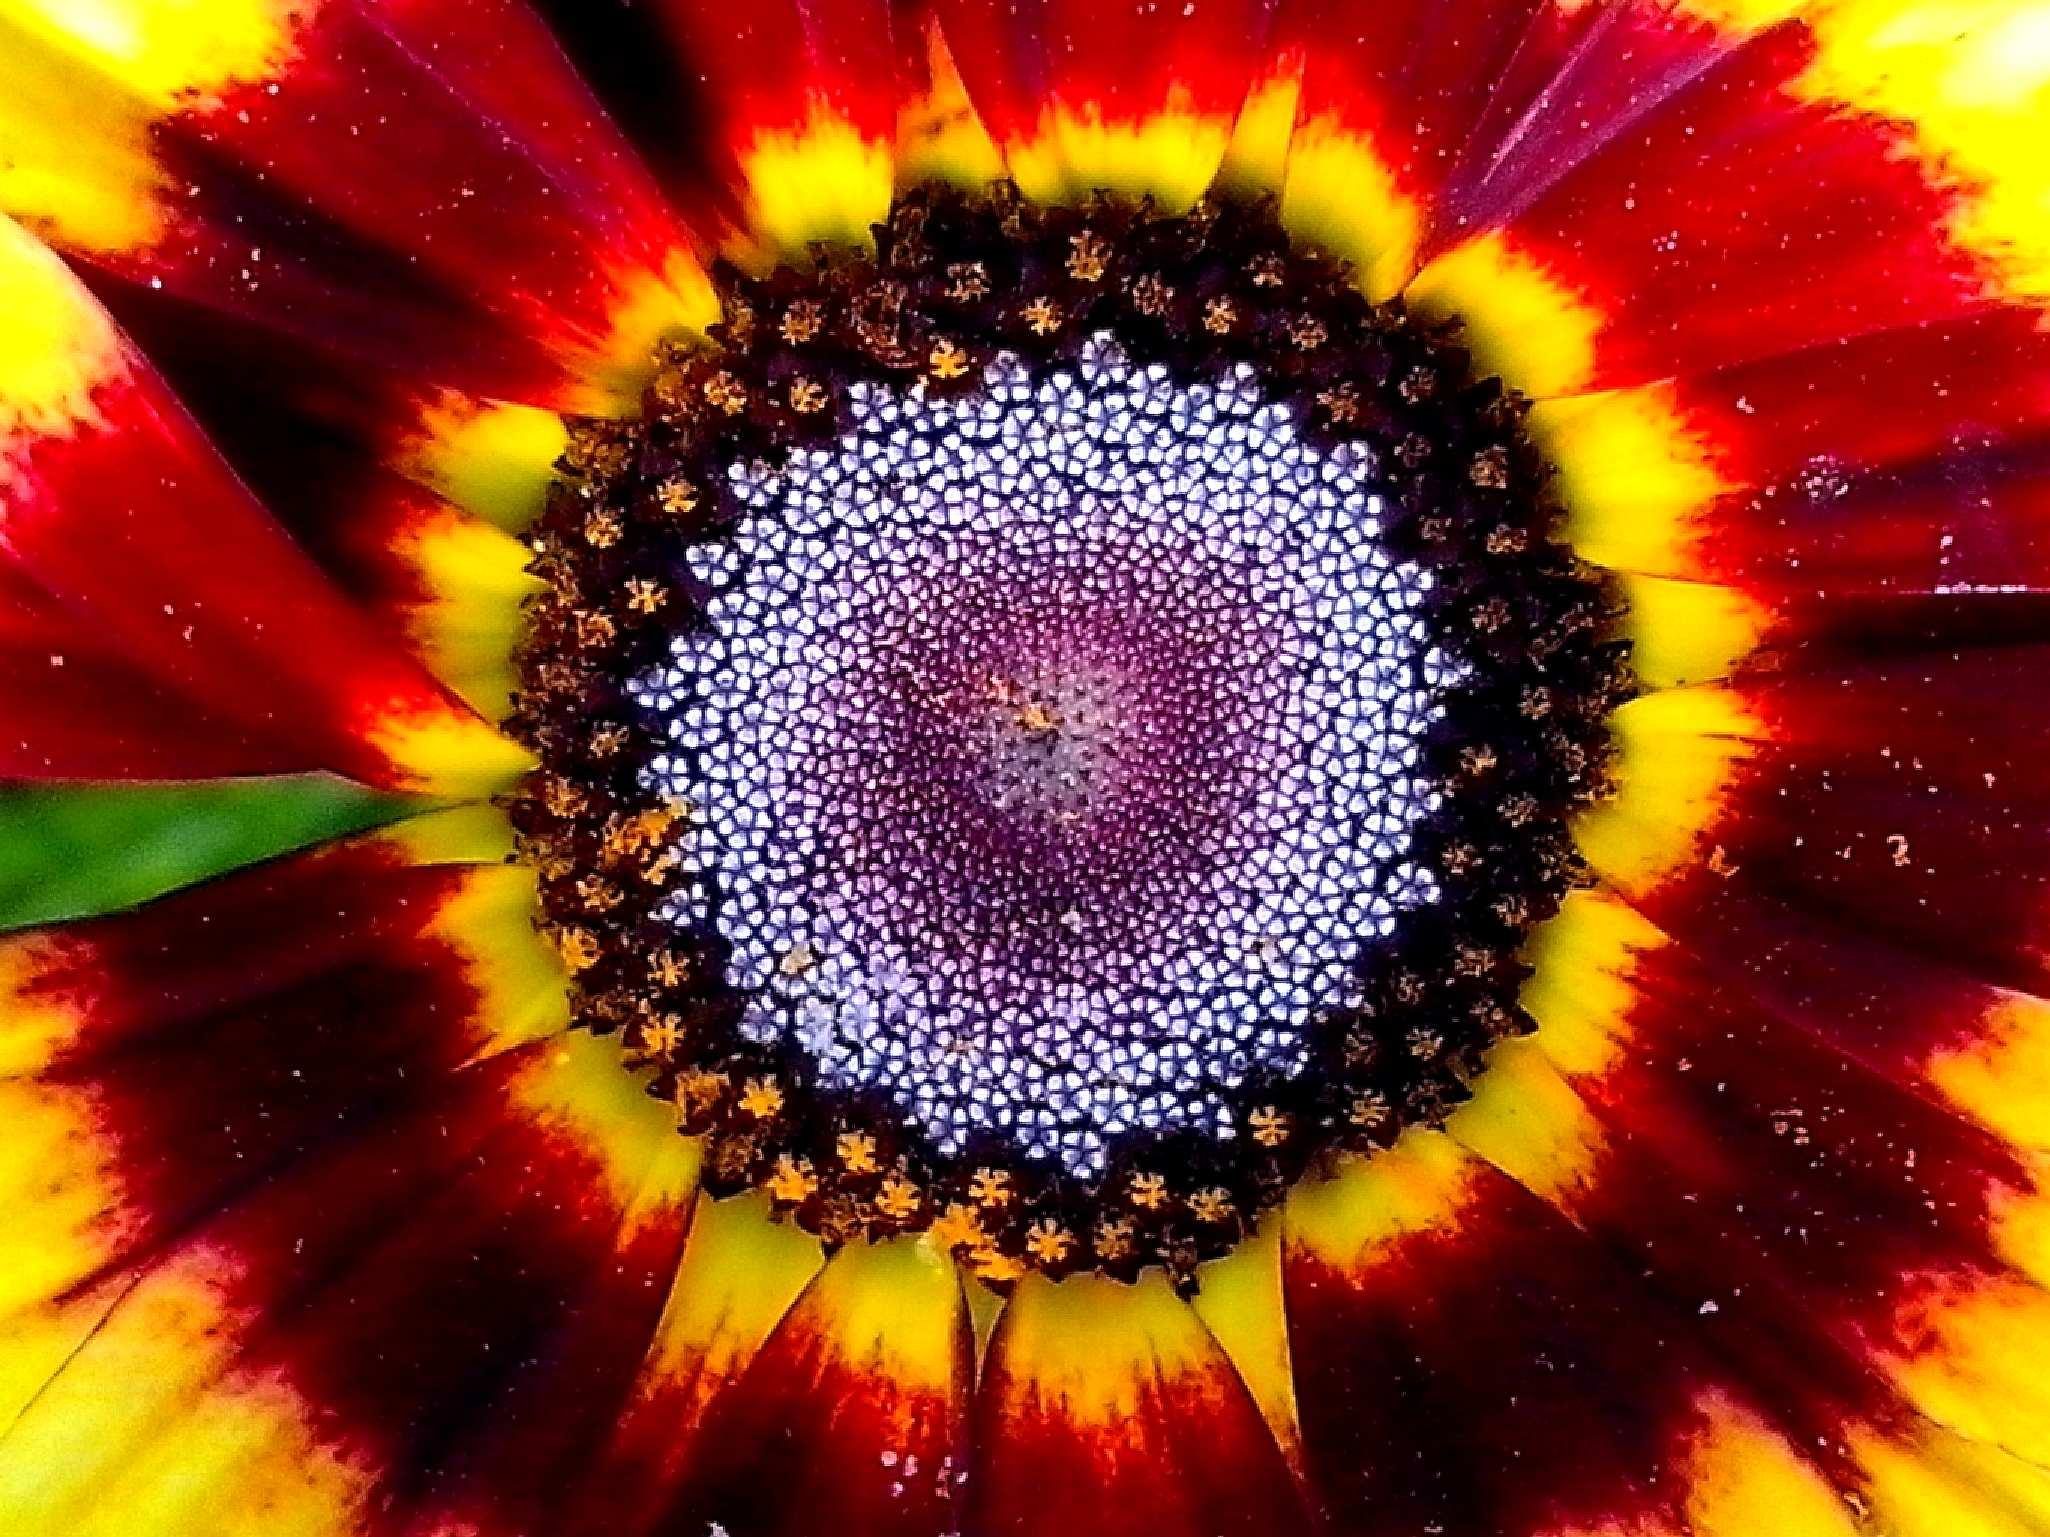 Free Picture Up Close Orange Flower Petals